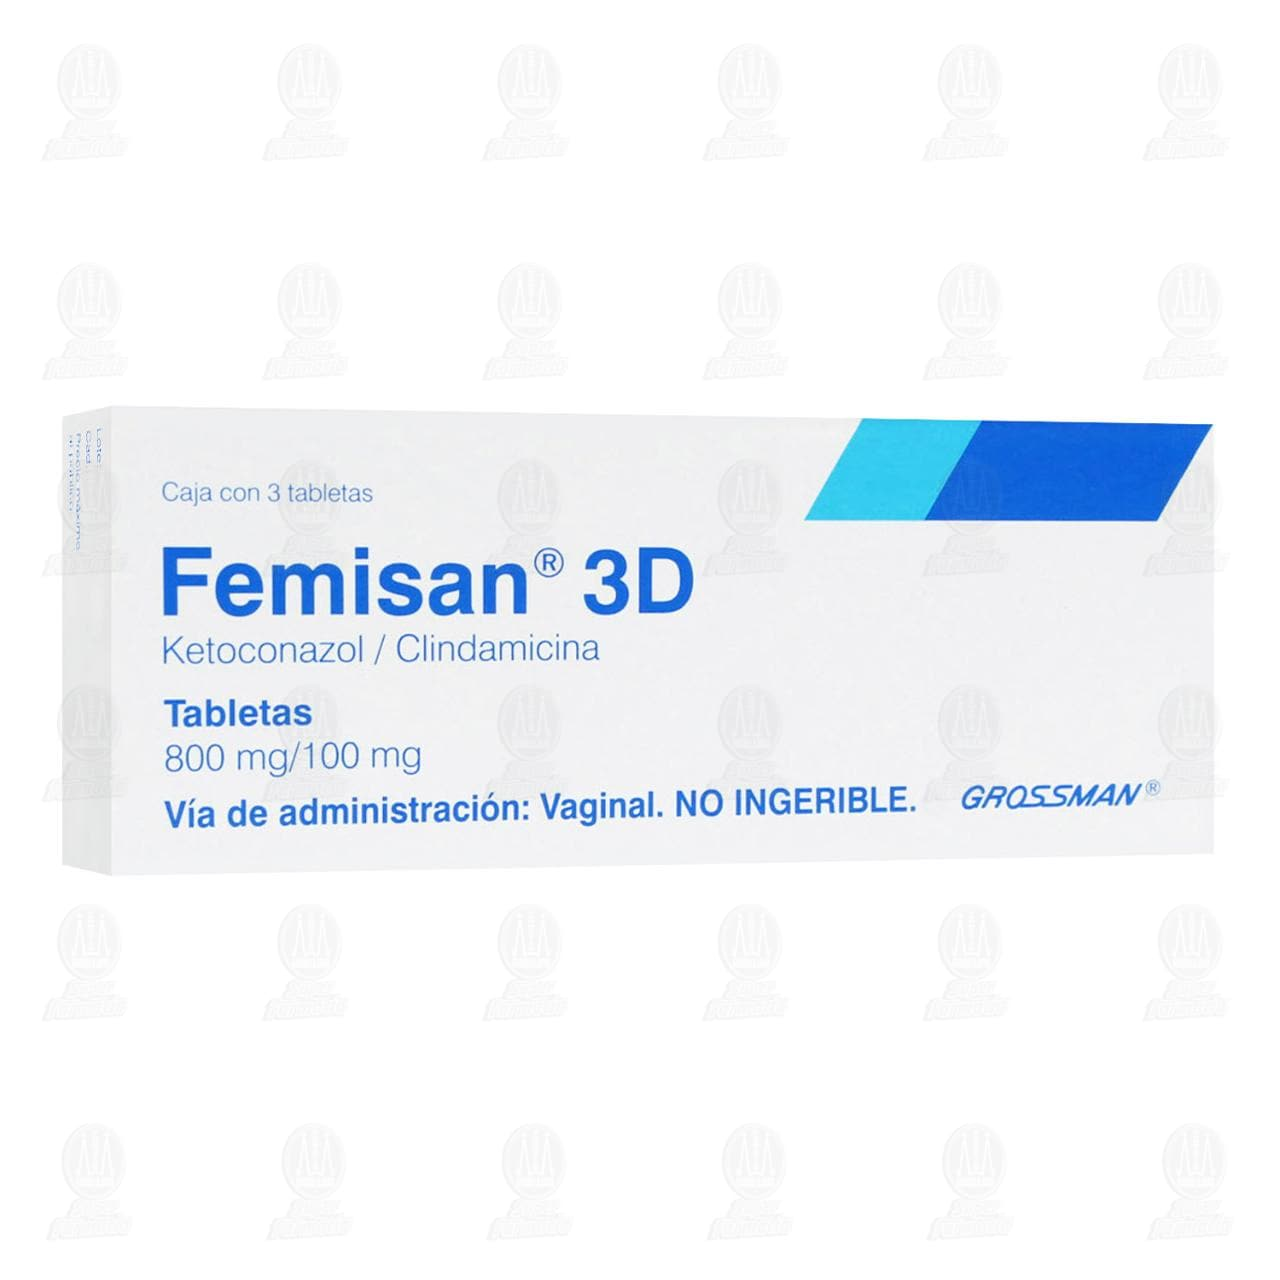 Comprar Femisan 3D 800mg/100mg 3 Tabletas en Farmacias Guadalajara